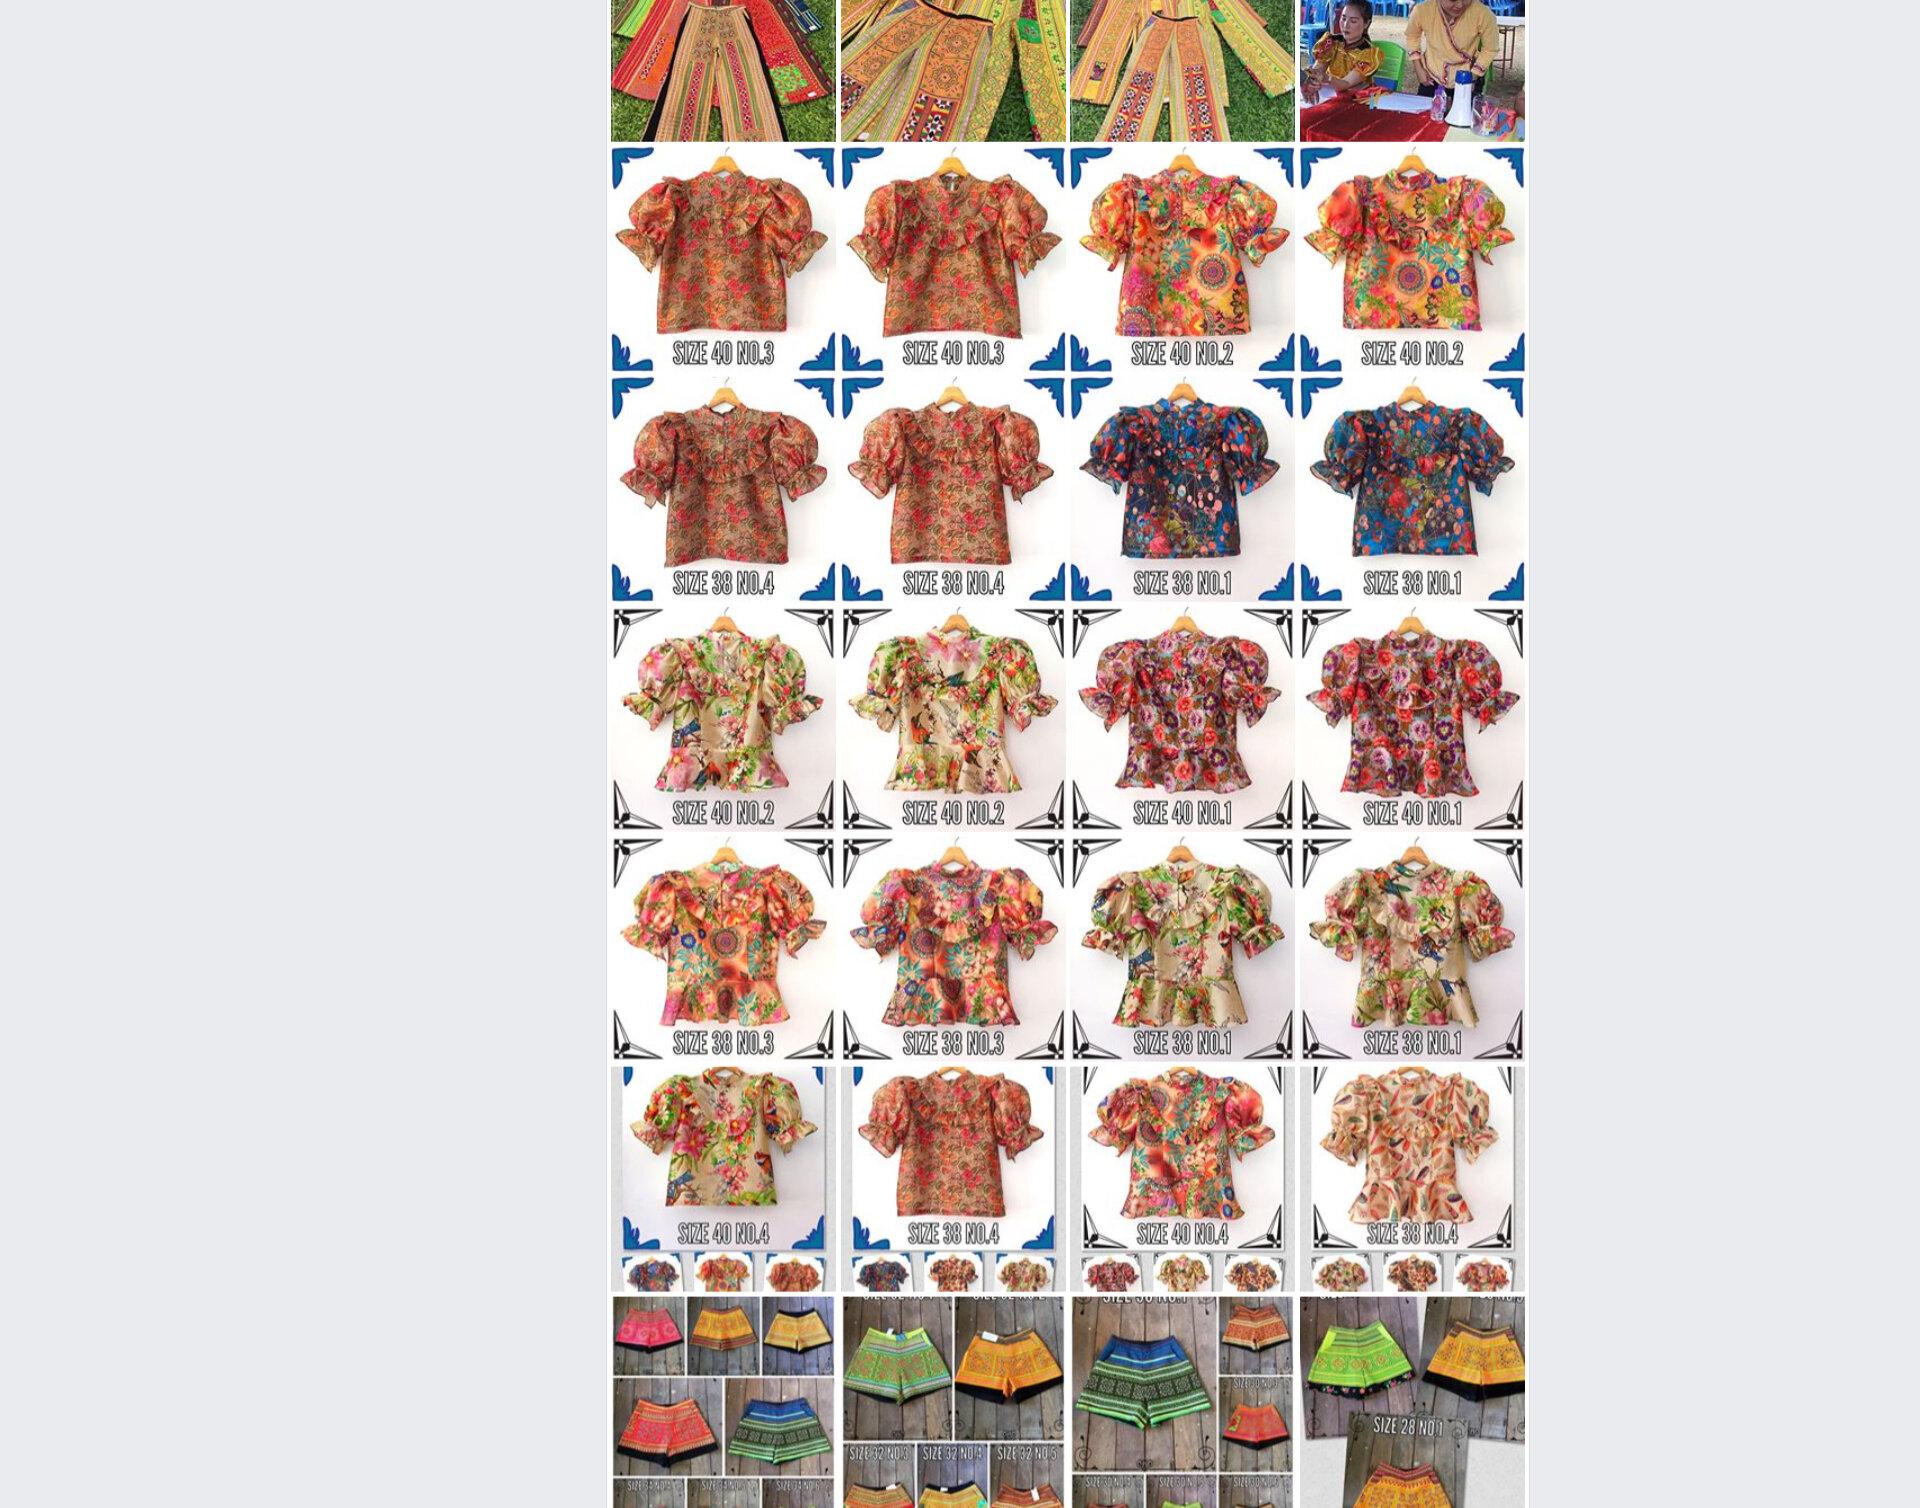 3screencapture-facebook-pg-TmsukVintageStyle-photos-2019-09-29-15_41_28-3.jpg